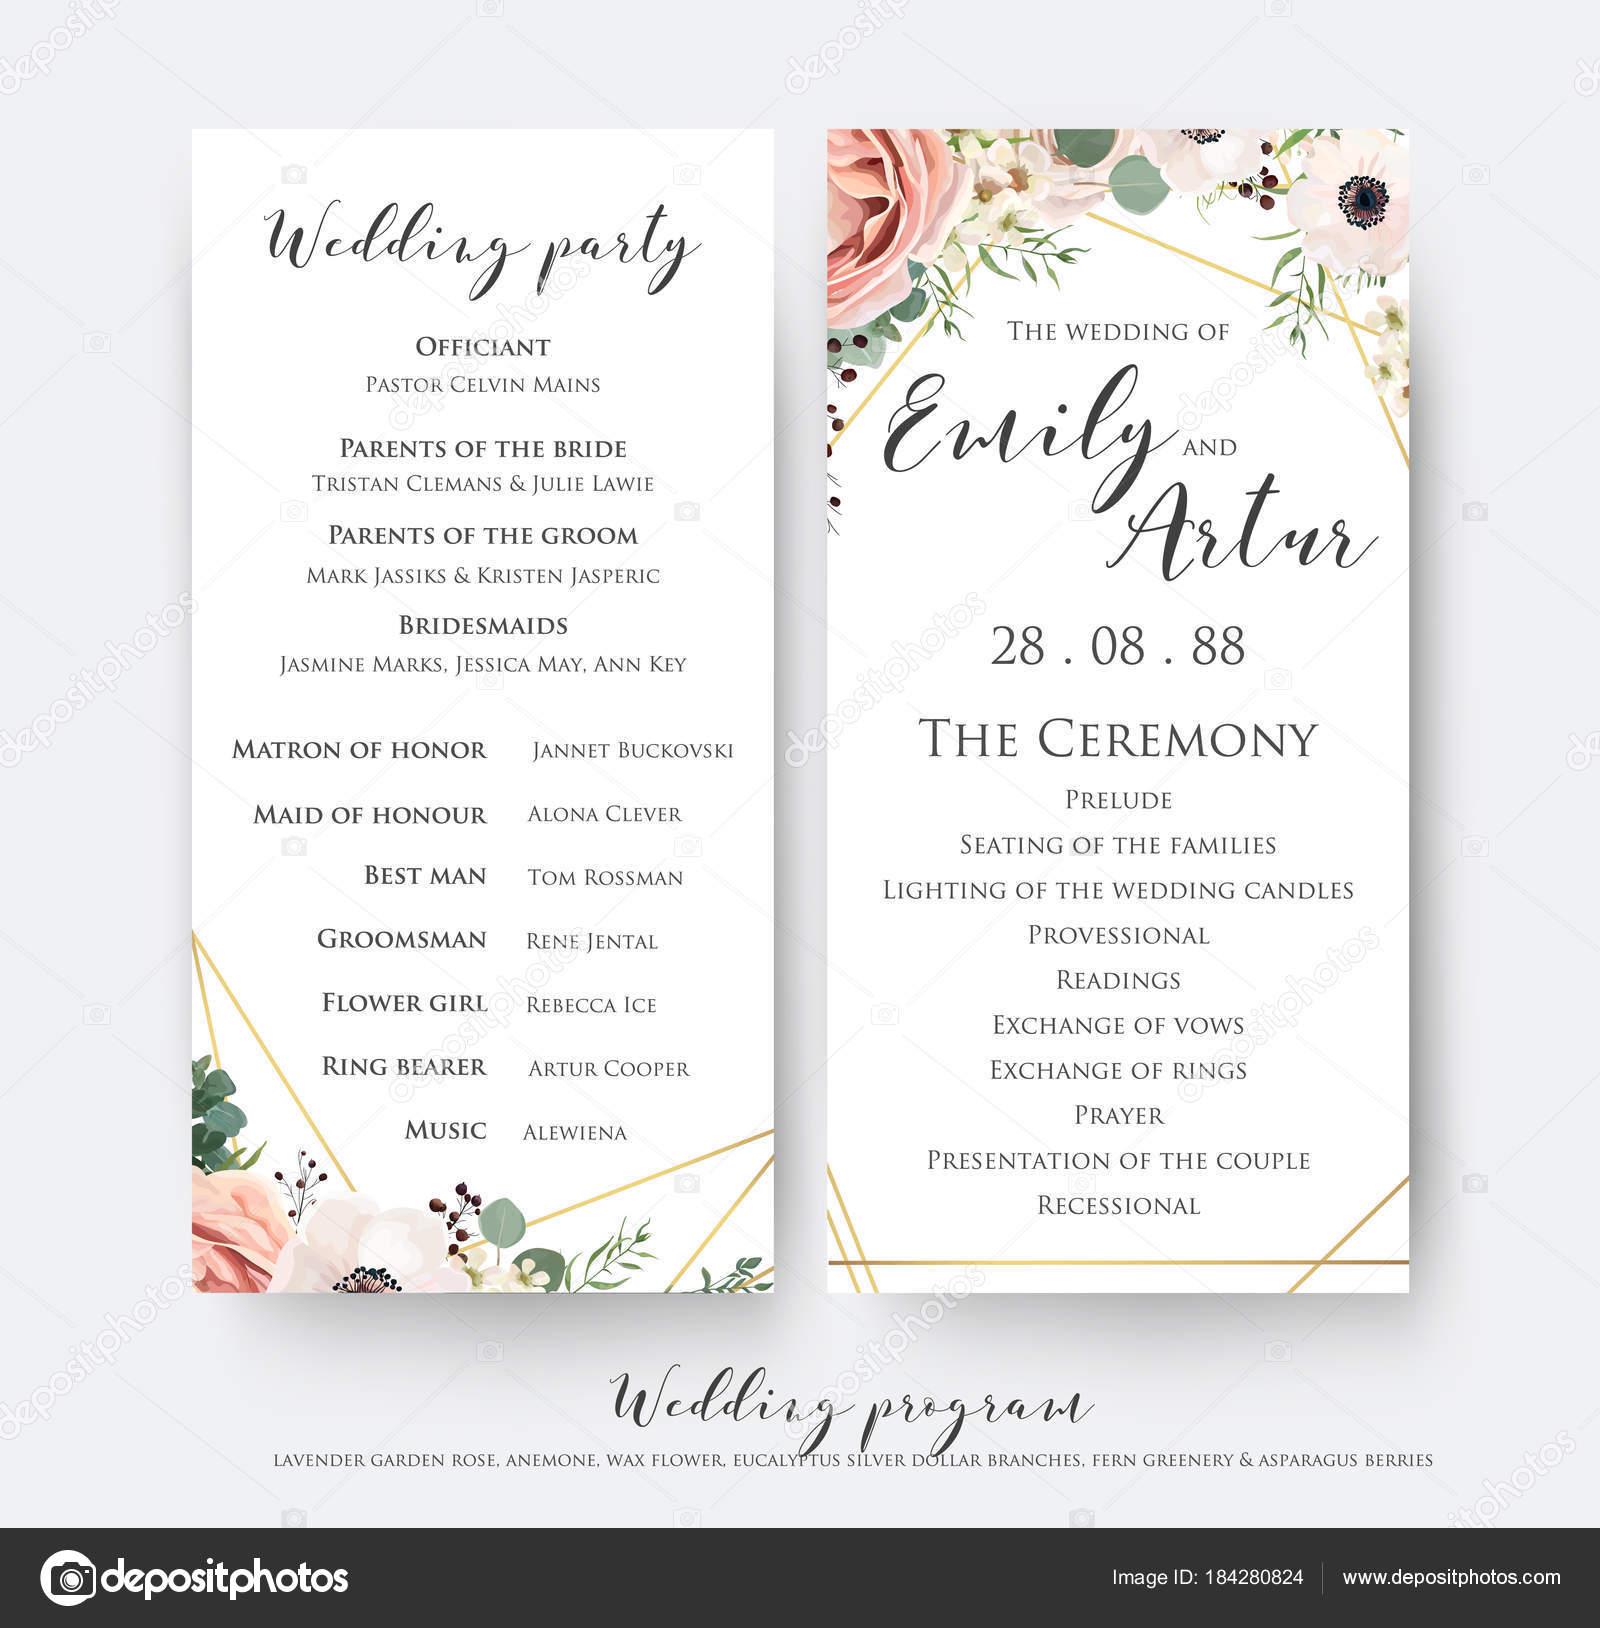 wedding program for party ceremony card design with elegant